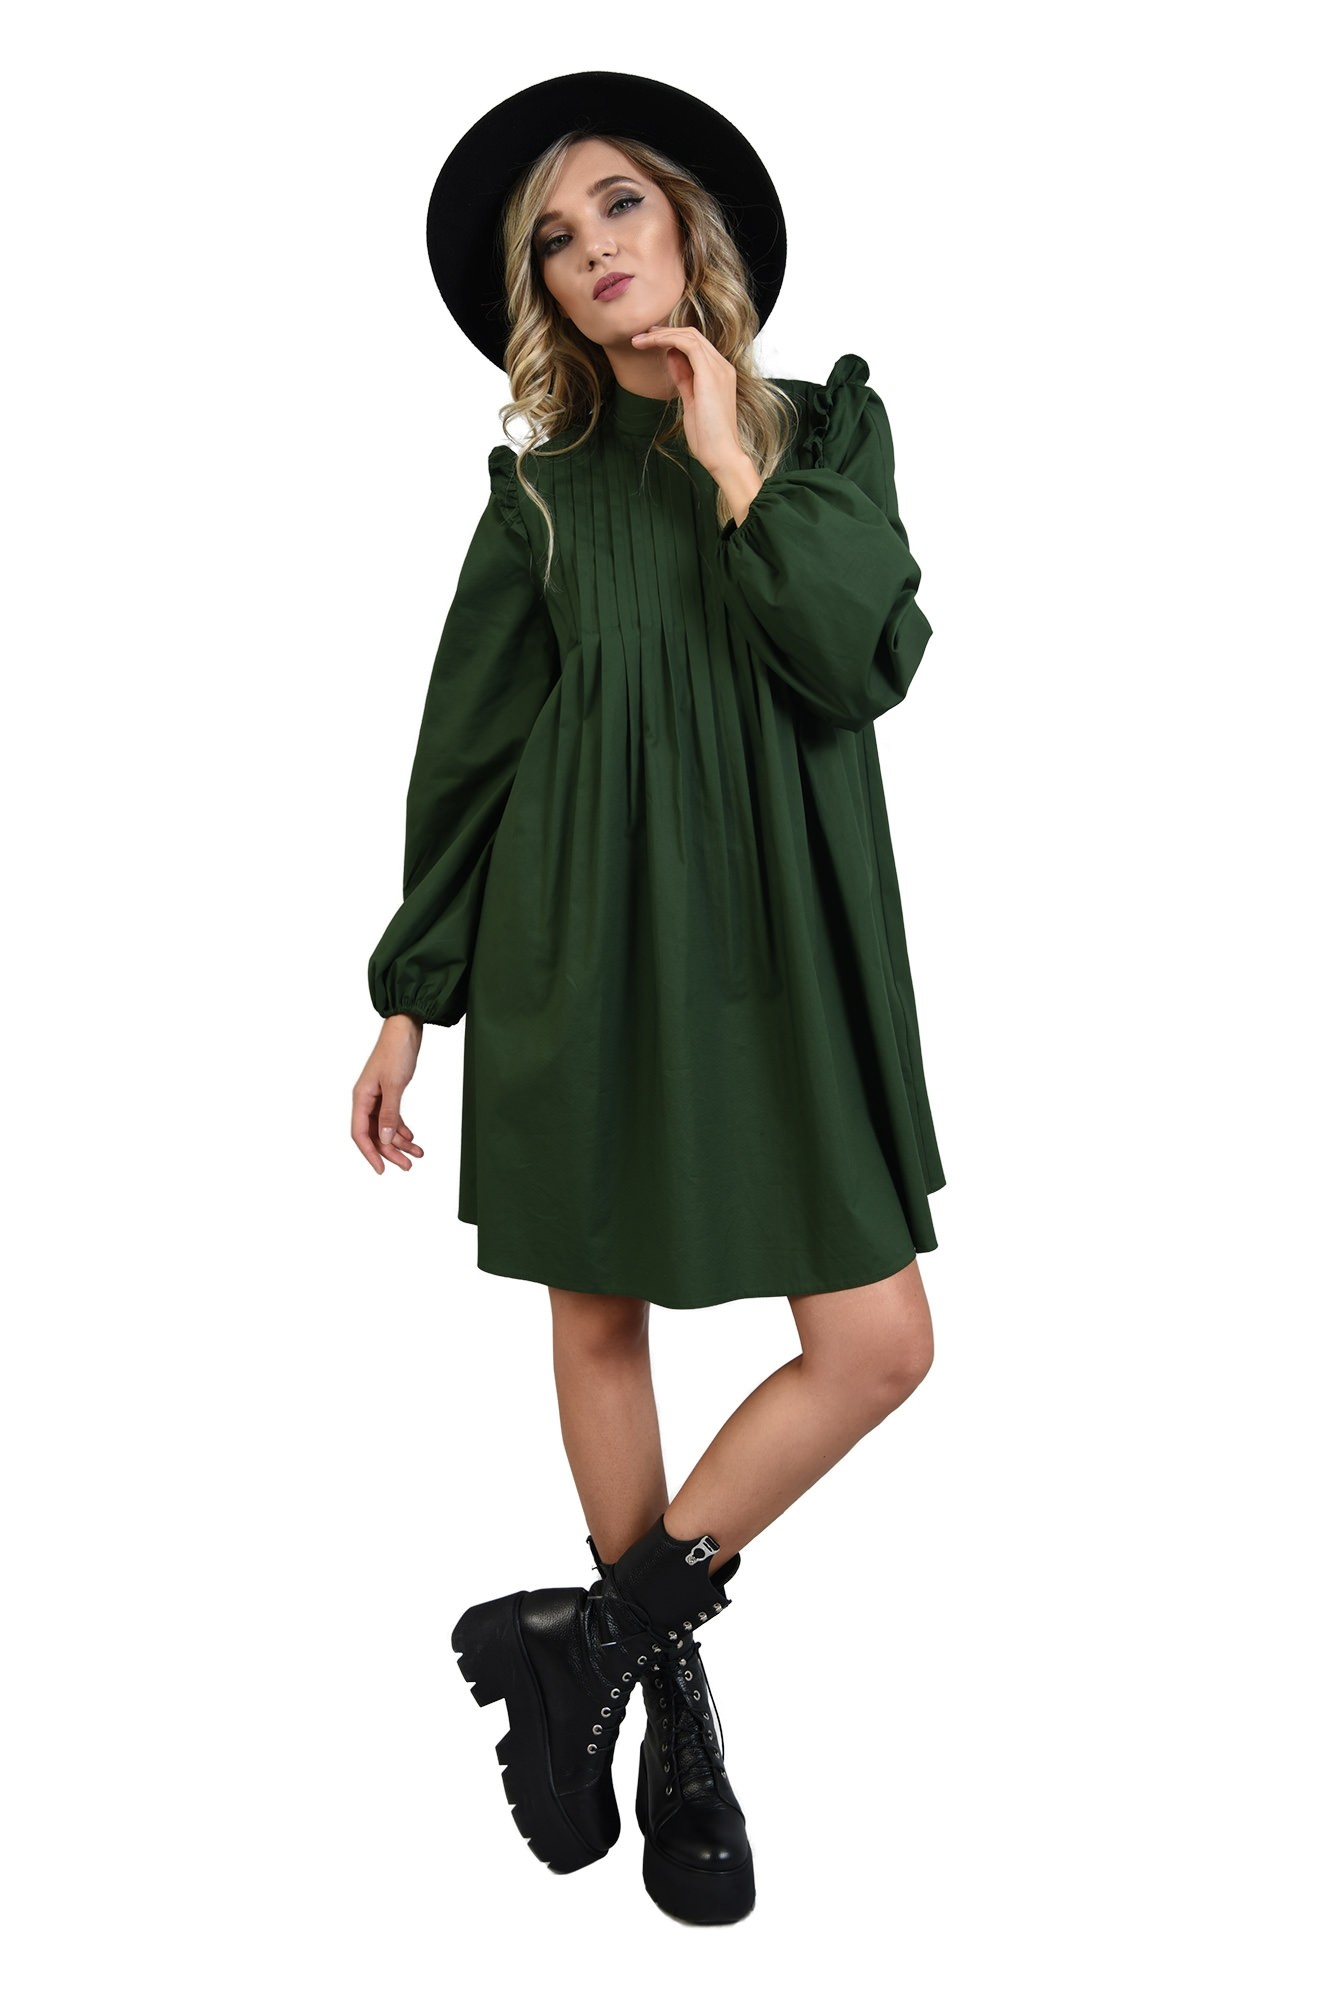 360 - rochie verde, din bumbac, cu pliuri decorative, maneci bufante